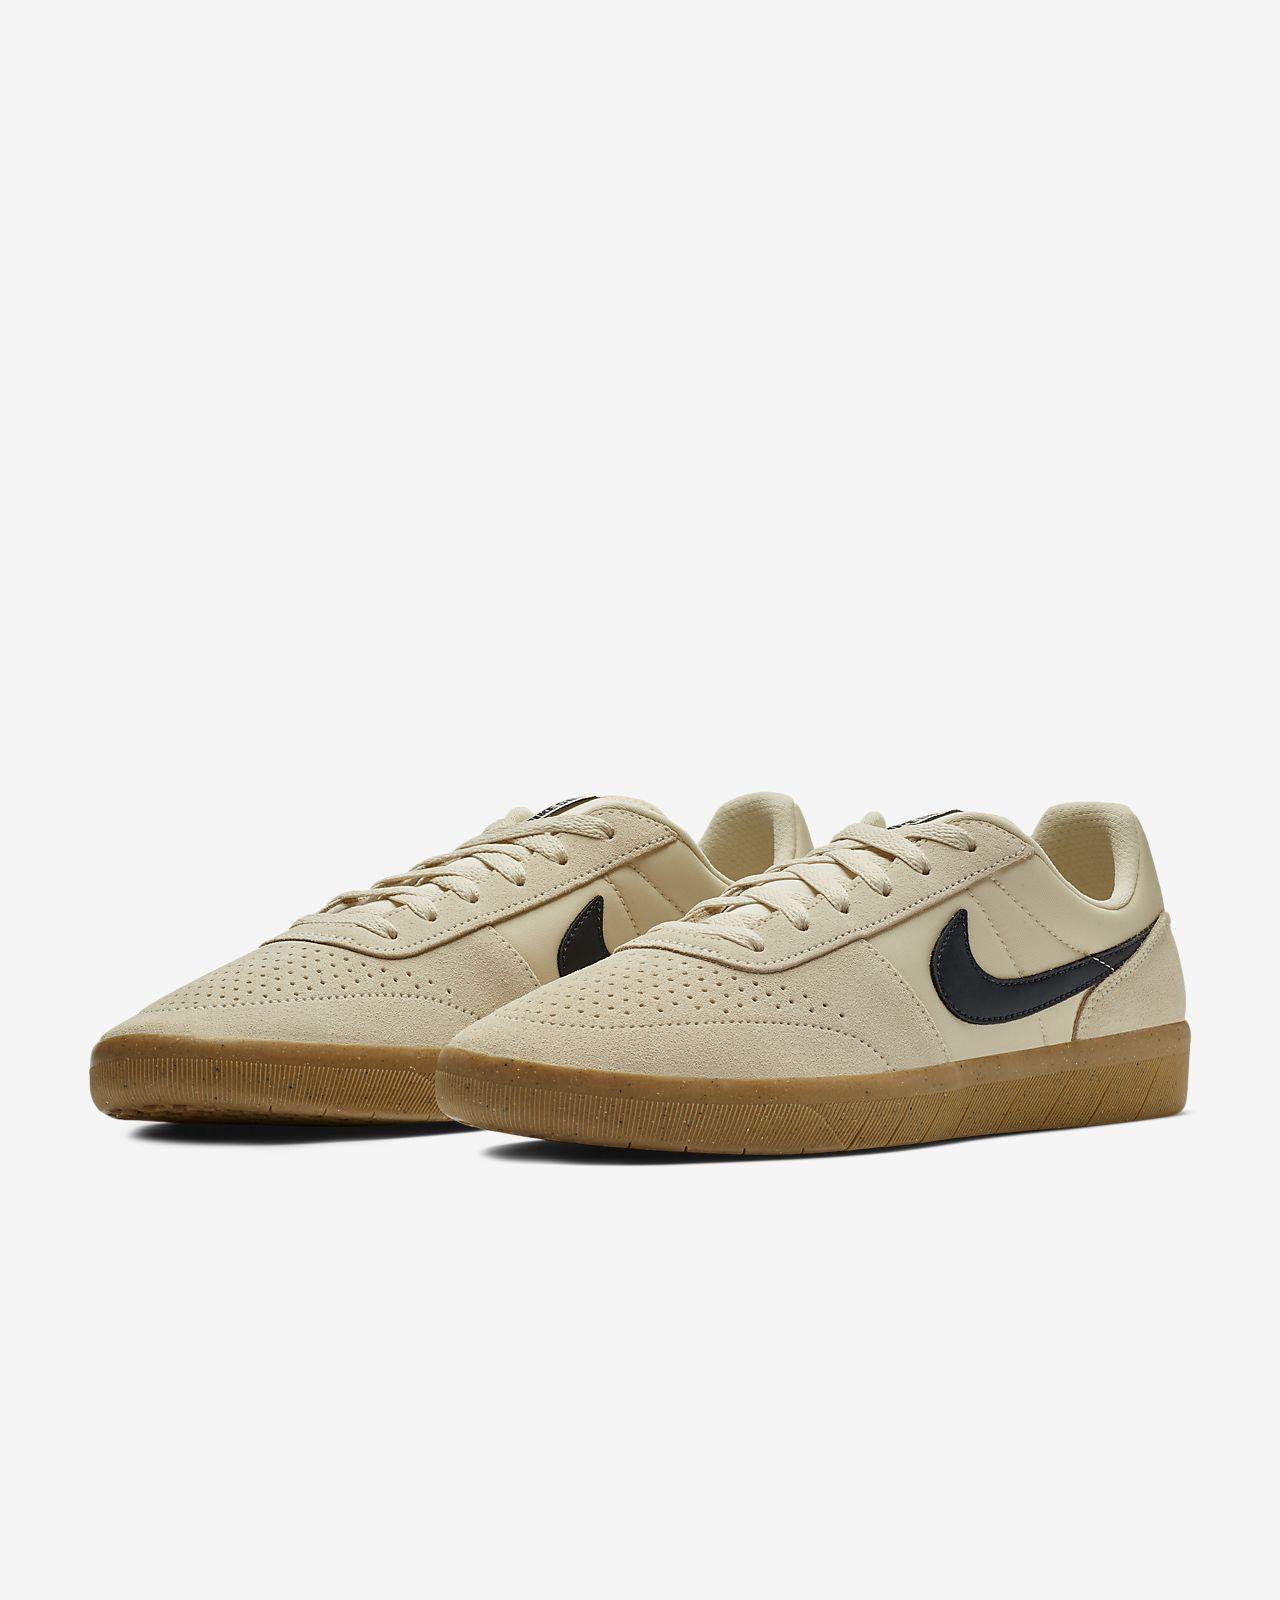 low priced 91544 bf1d2 ... Skateboardsko Nike SB Team Classic för män